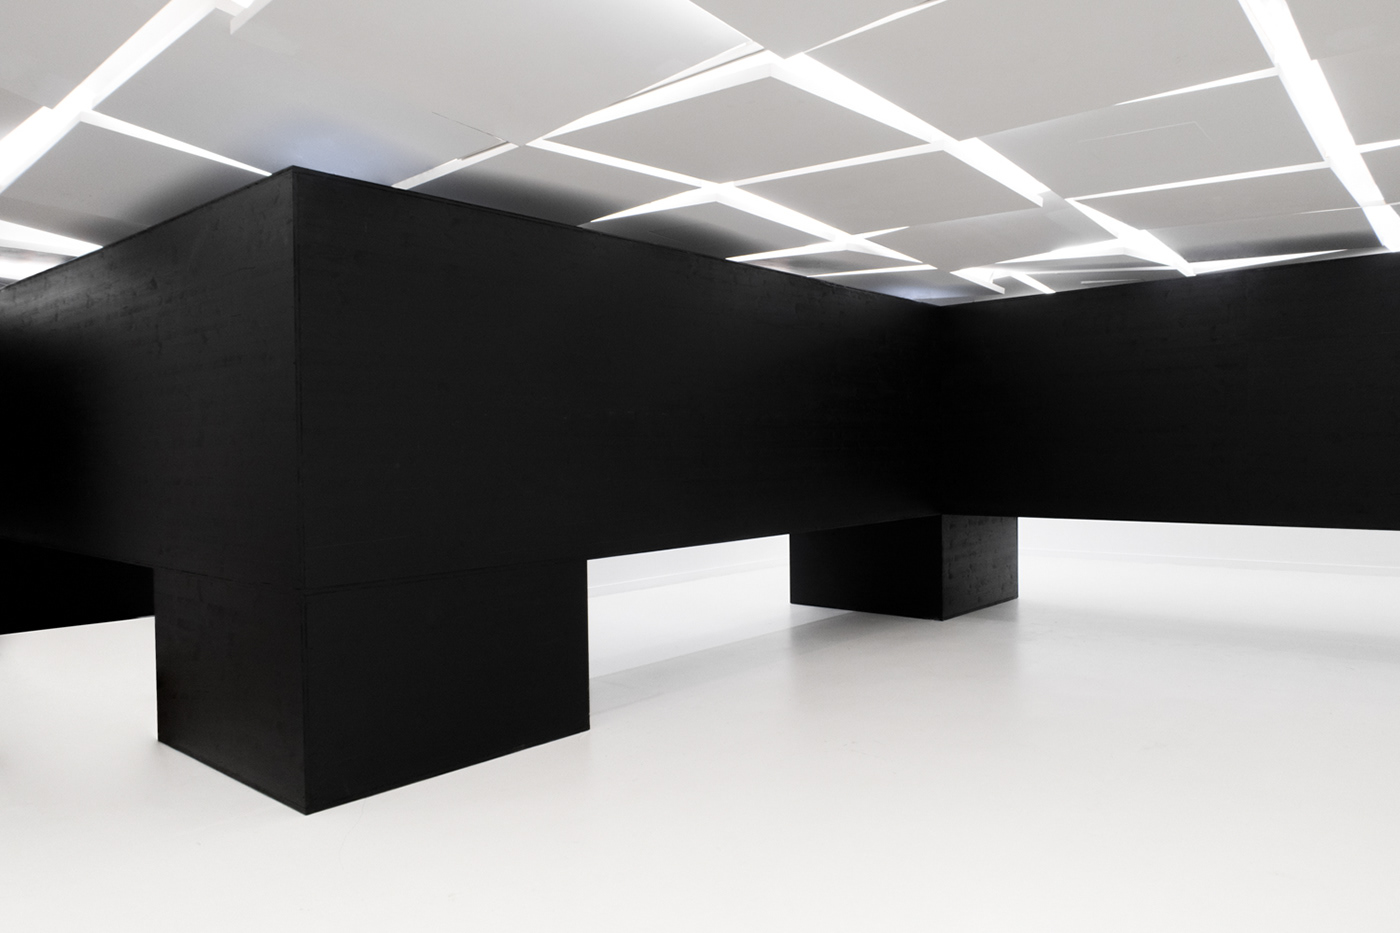 lang baumann galerie des galieres contemporary art architecture Photography  Dario Ruggiero art installation